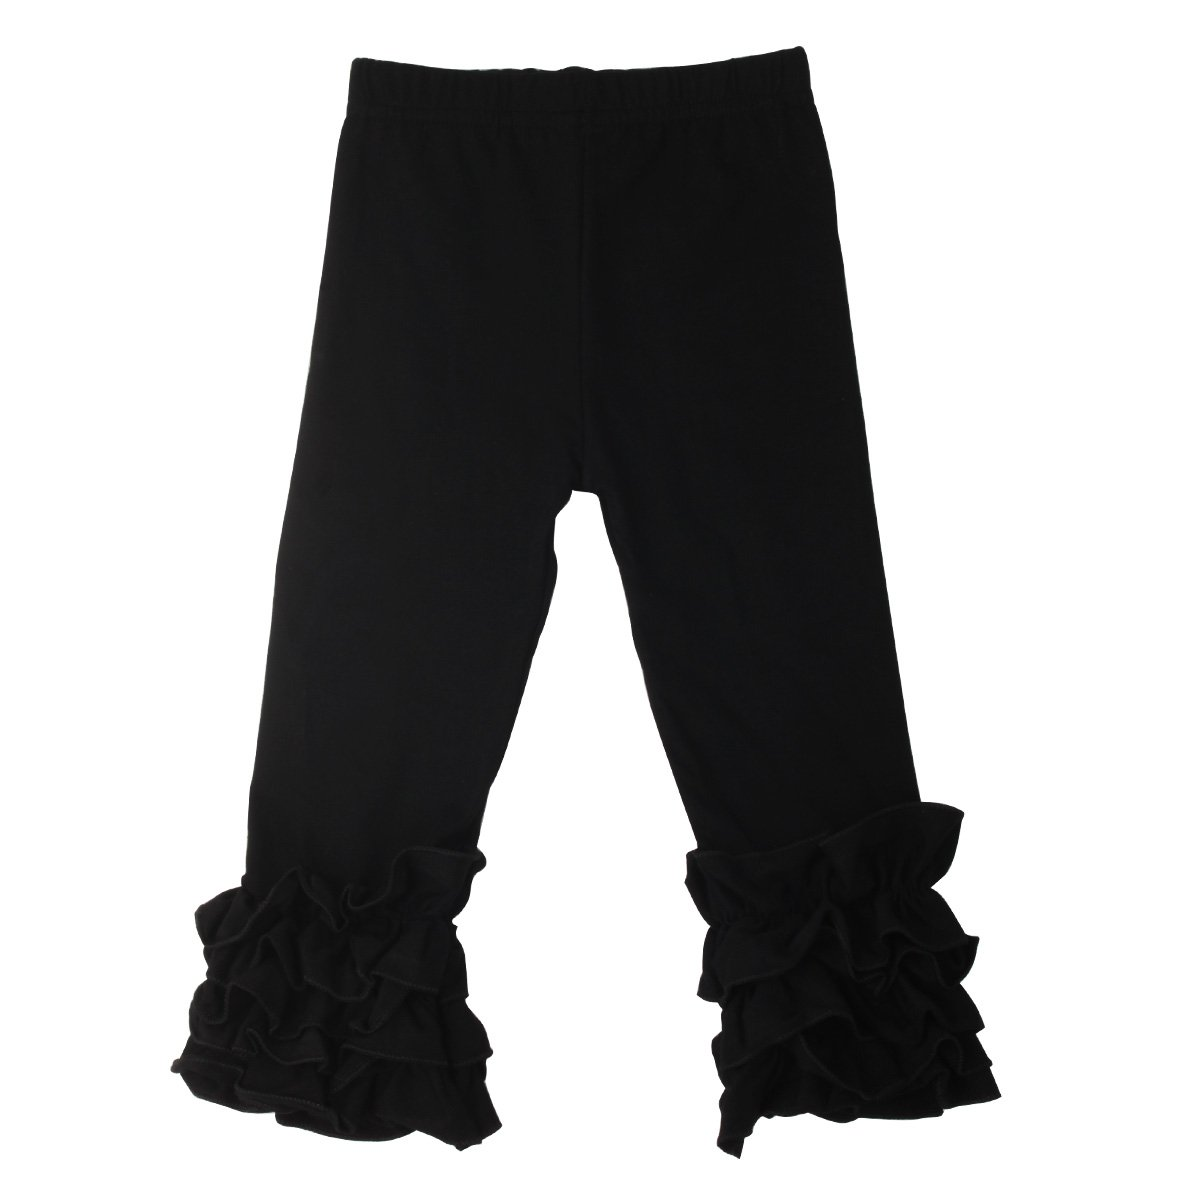 Slowera Little Girls' Ruffle Leggings Baby Toddler Solid Color Flower Pants (Black, S: 24-36 Months)